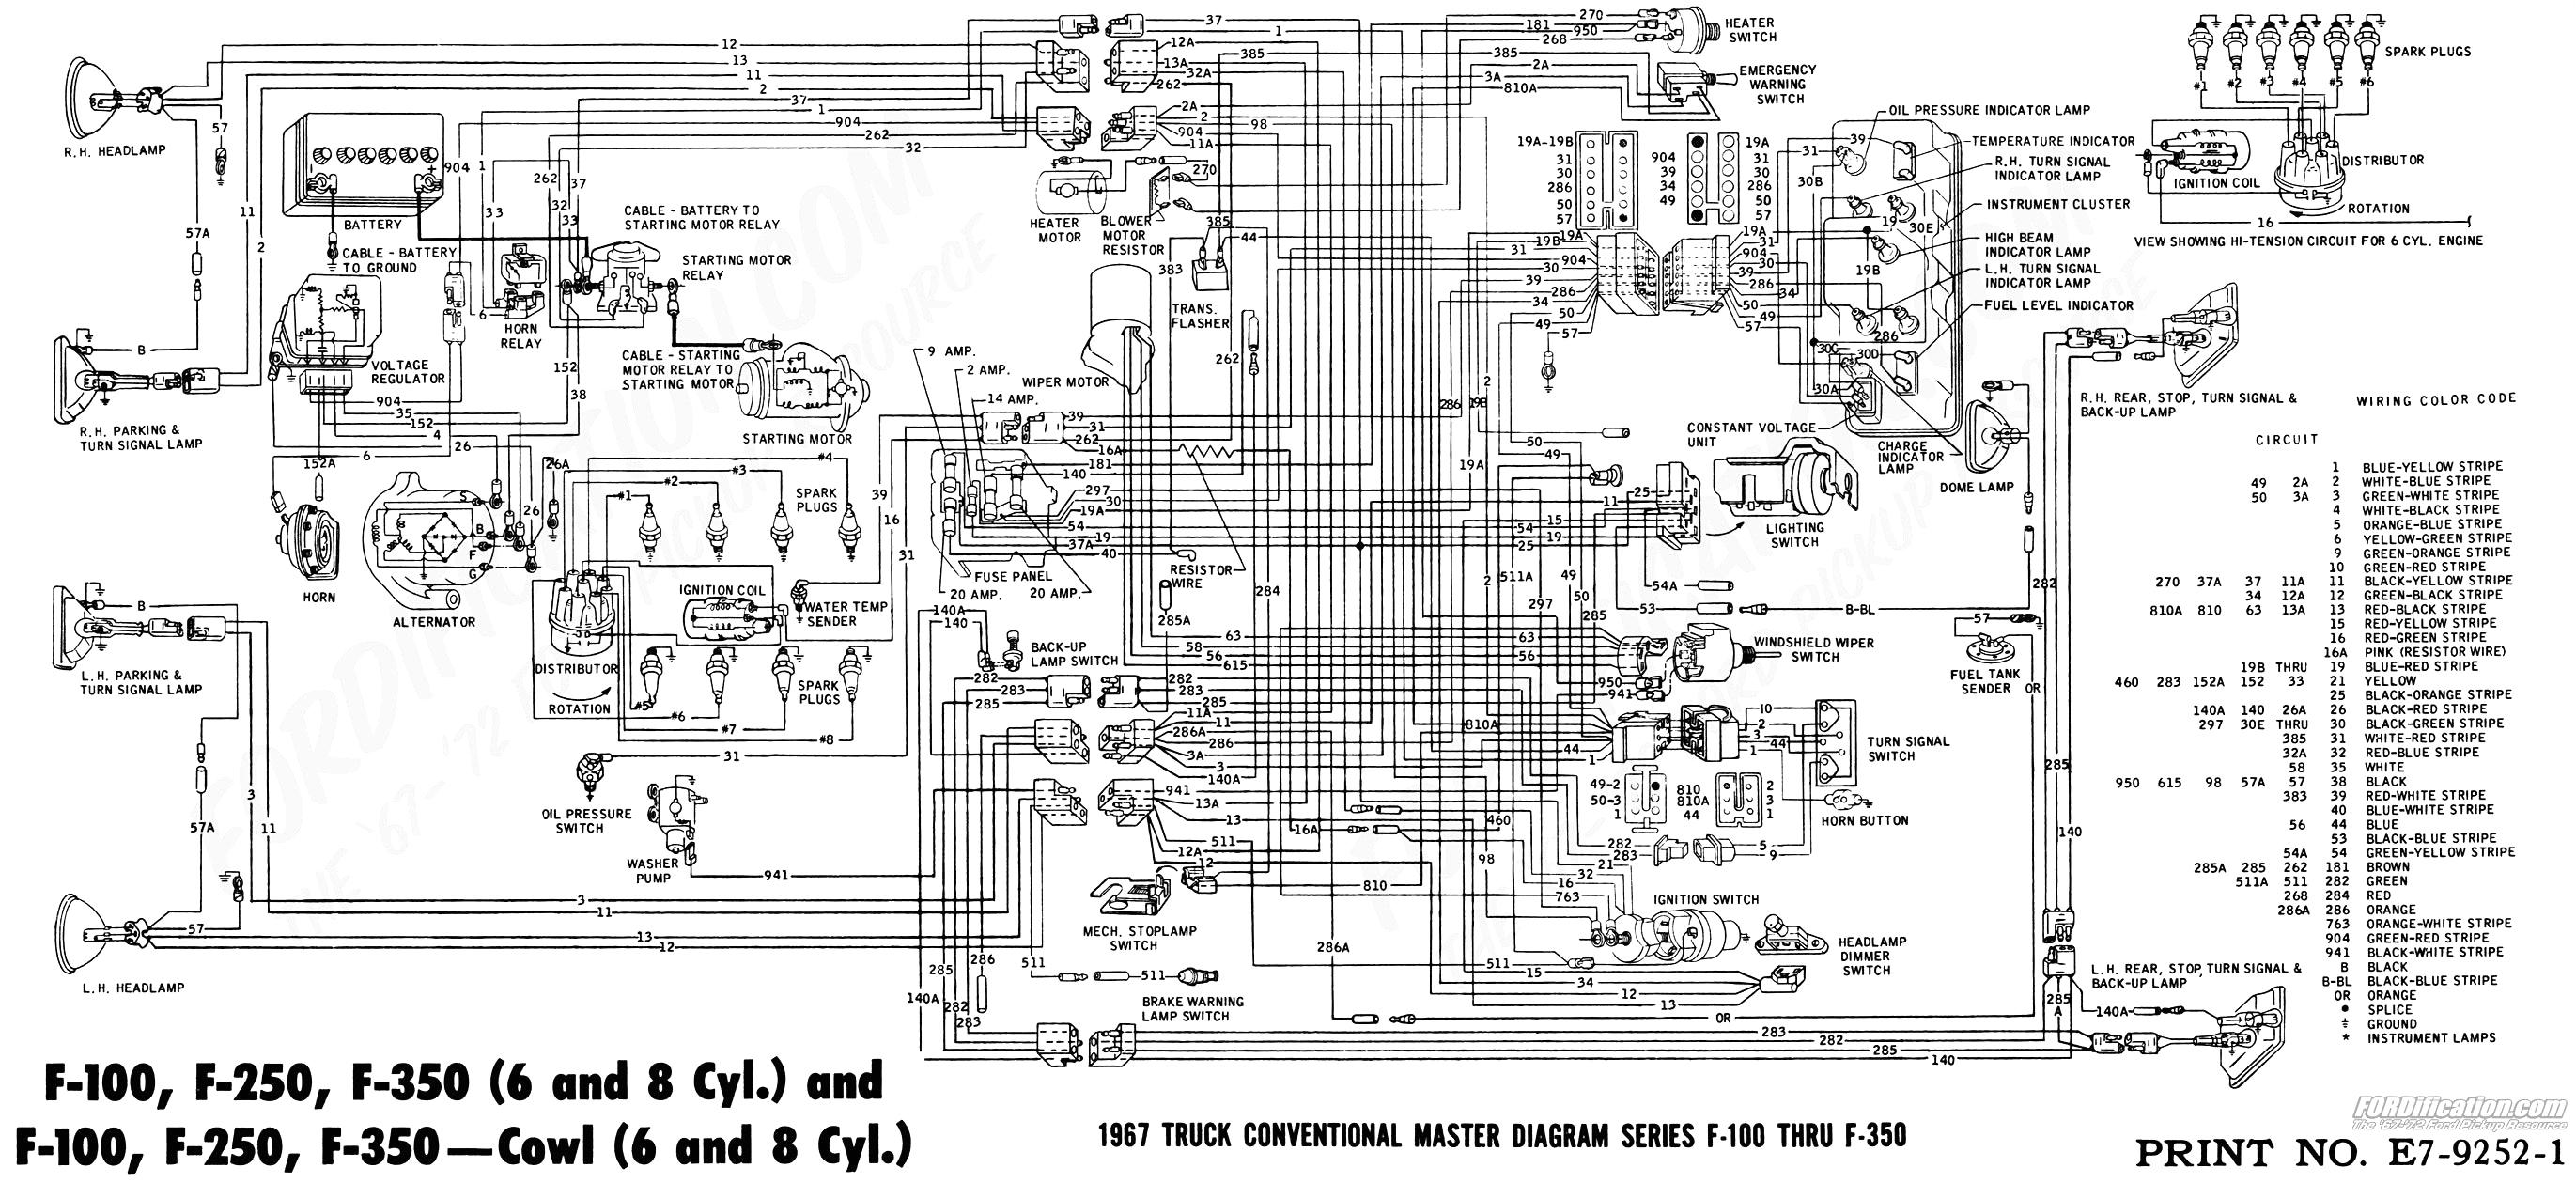 1989 ford f150 electrical diagram wiring diagram expert circuit diagram 1989 f 150